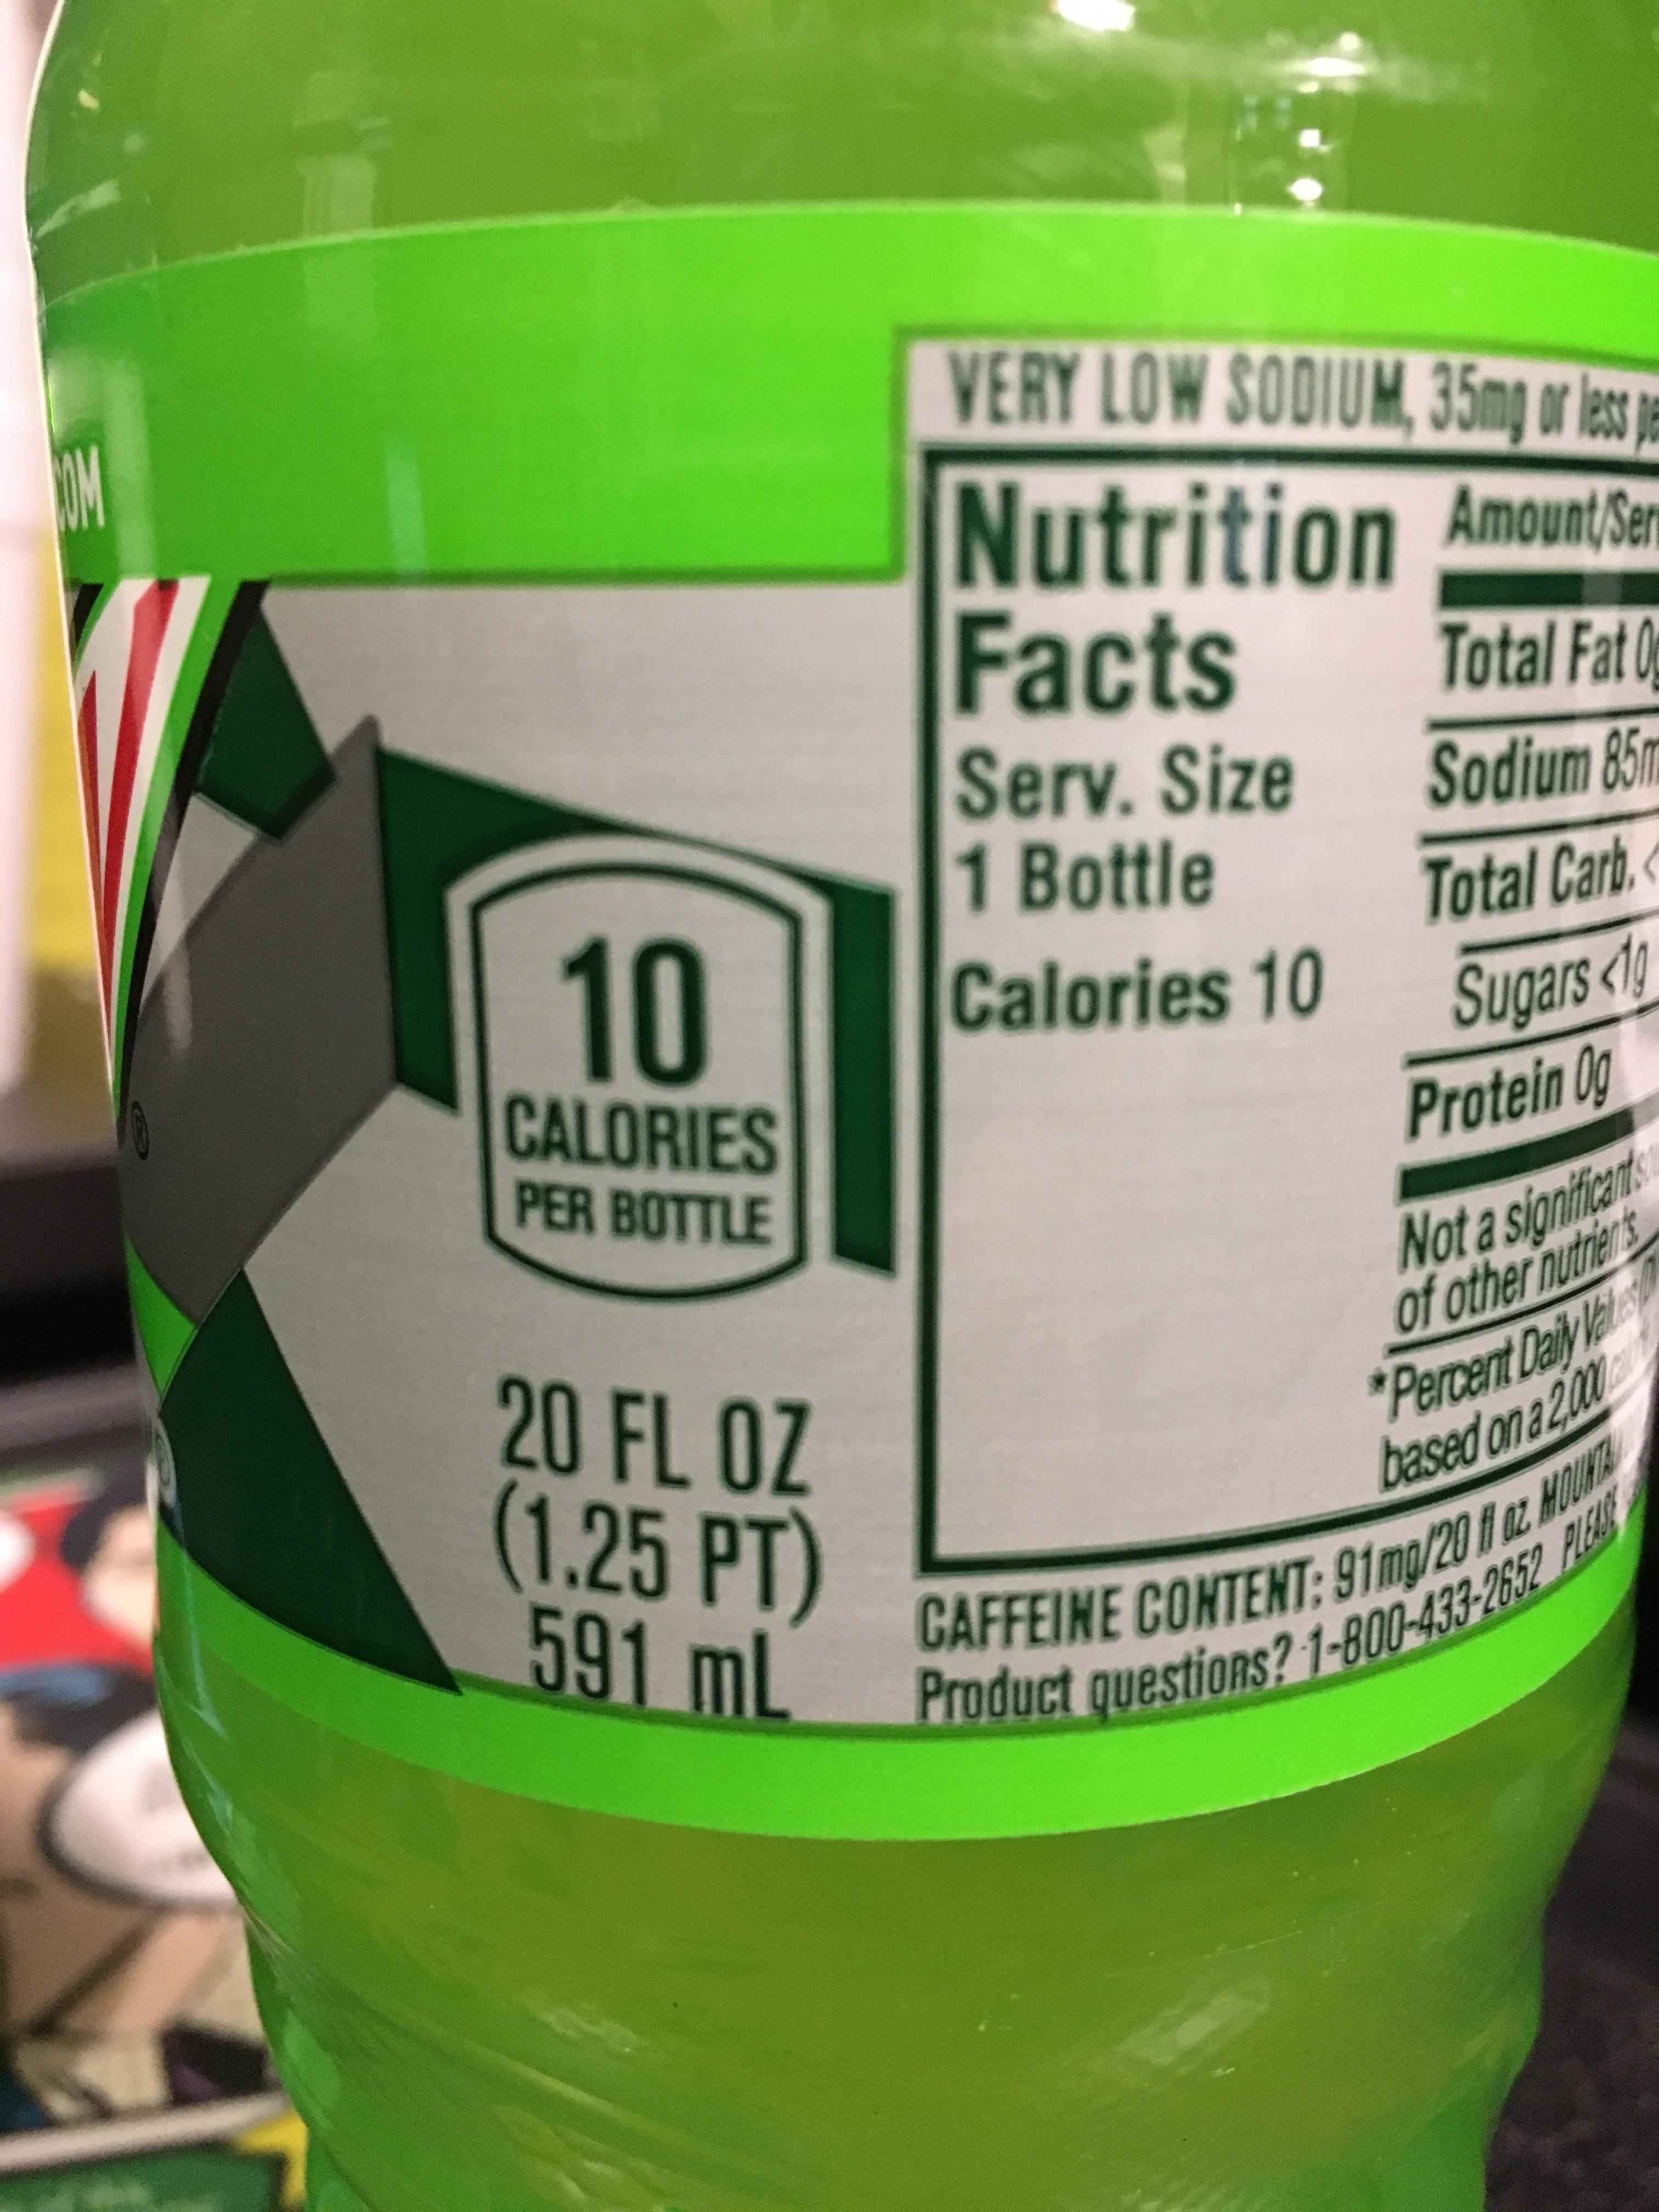 Diet Mt Dew Has 10 Calories In A Bottle Always Thought It Was 0 Calories In Sugar Diet Guide Ayurveda Diet